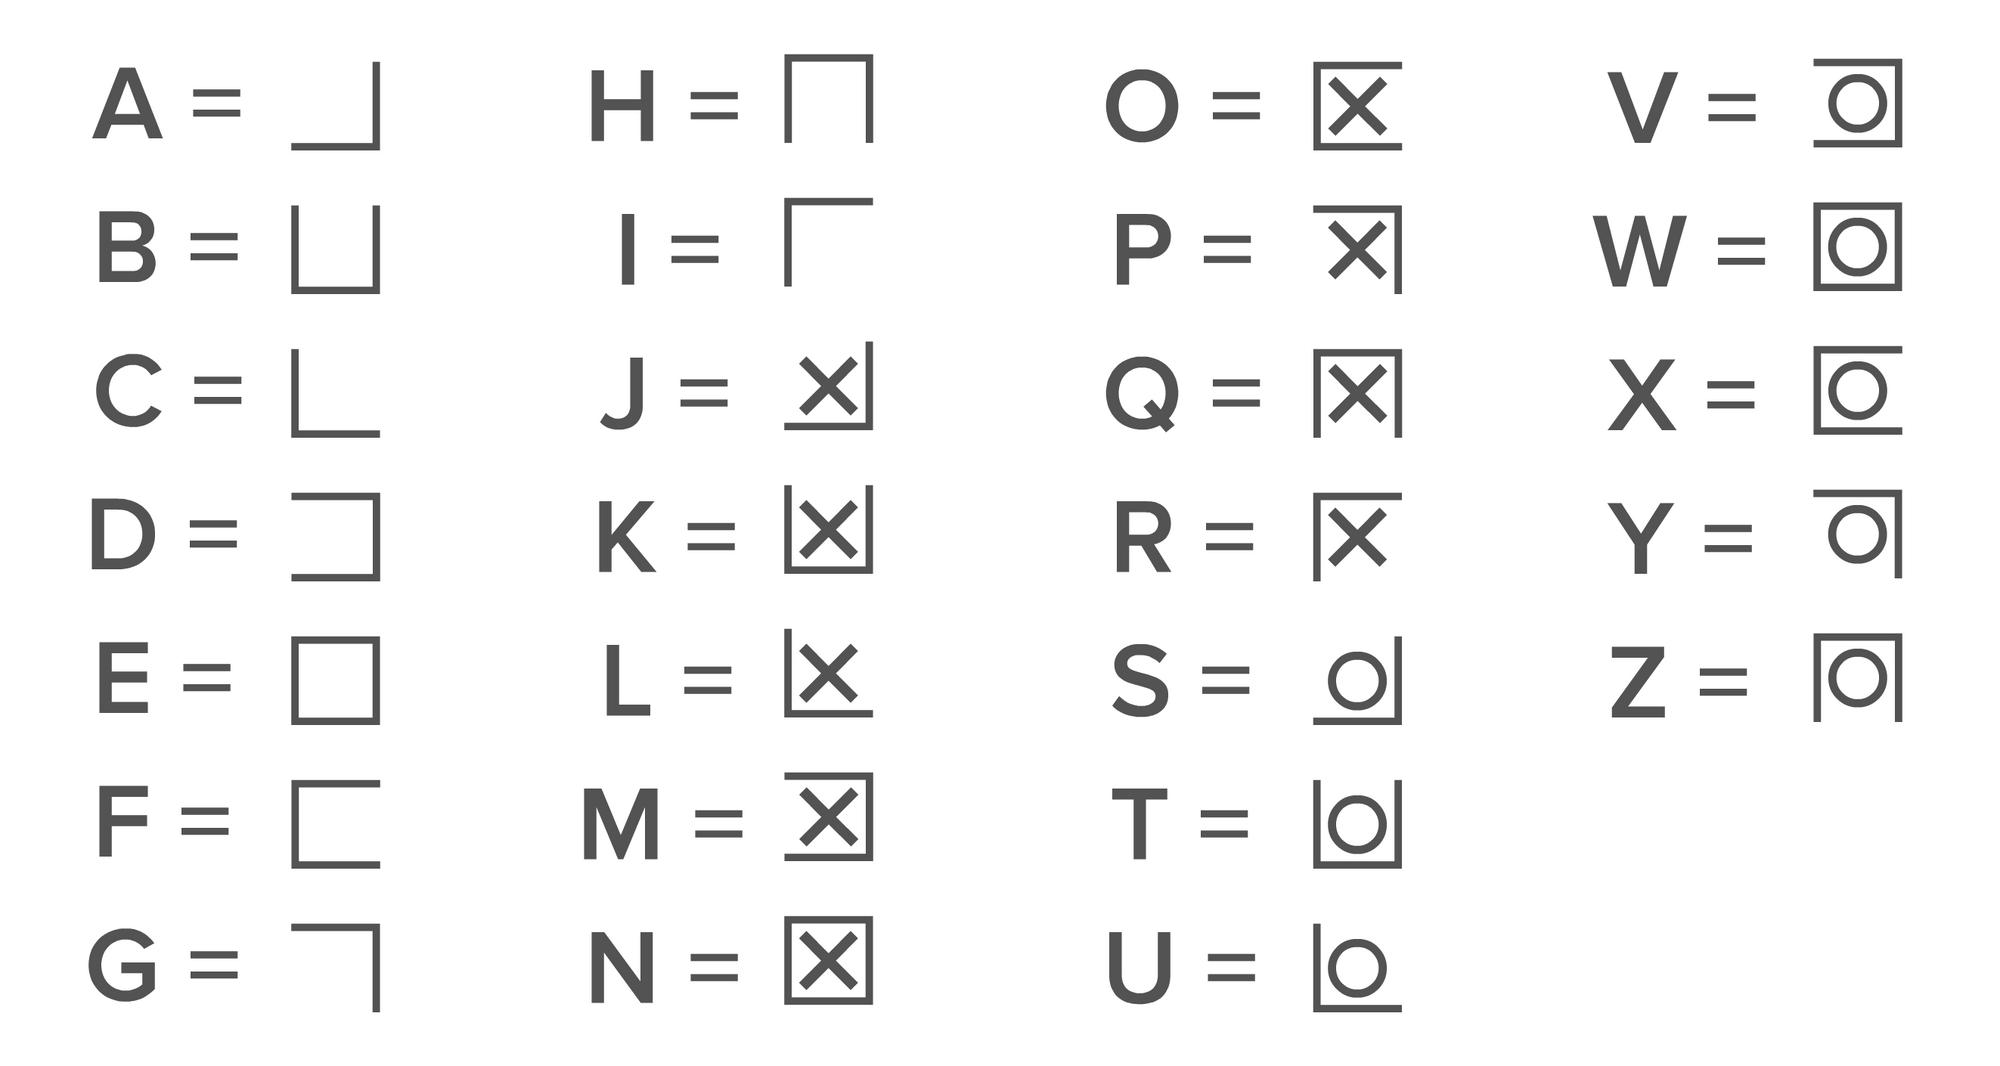 Tic Tac Code | Club Penguin Wiki | FANDOM powered by Wikia